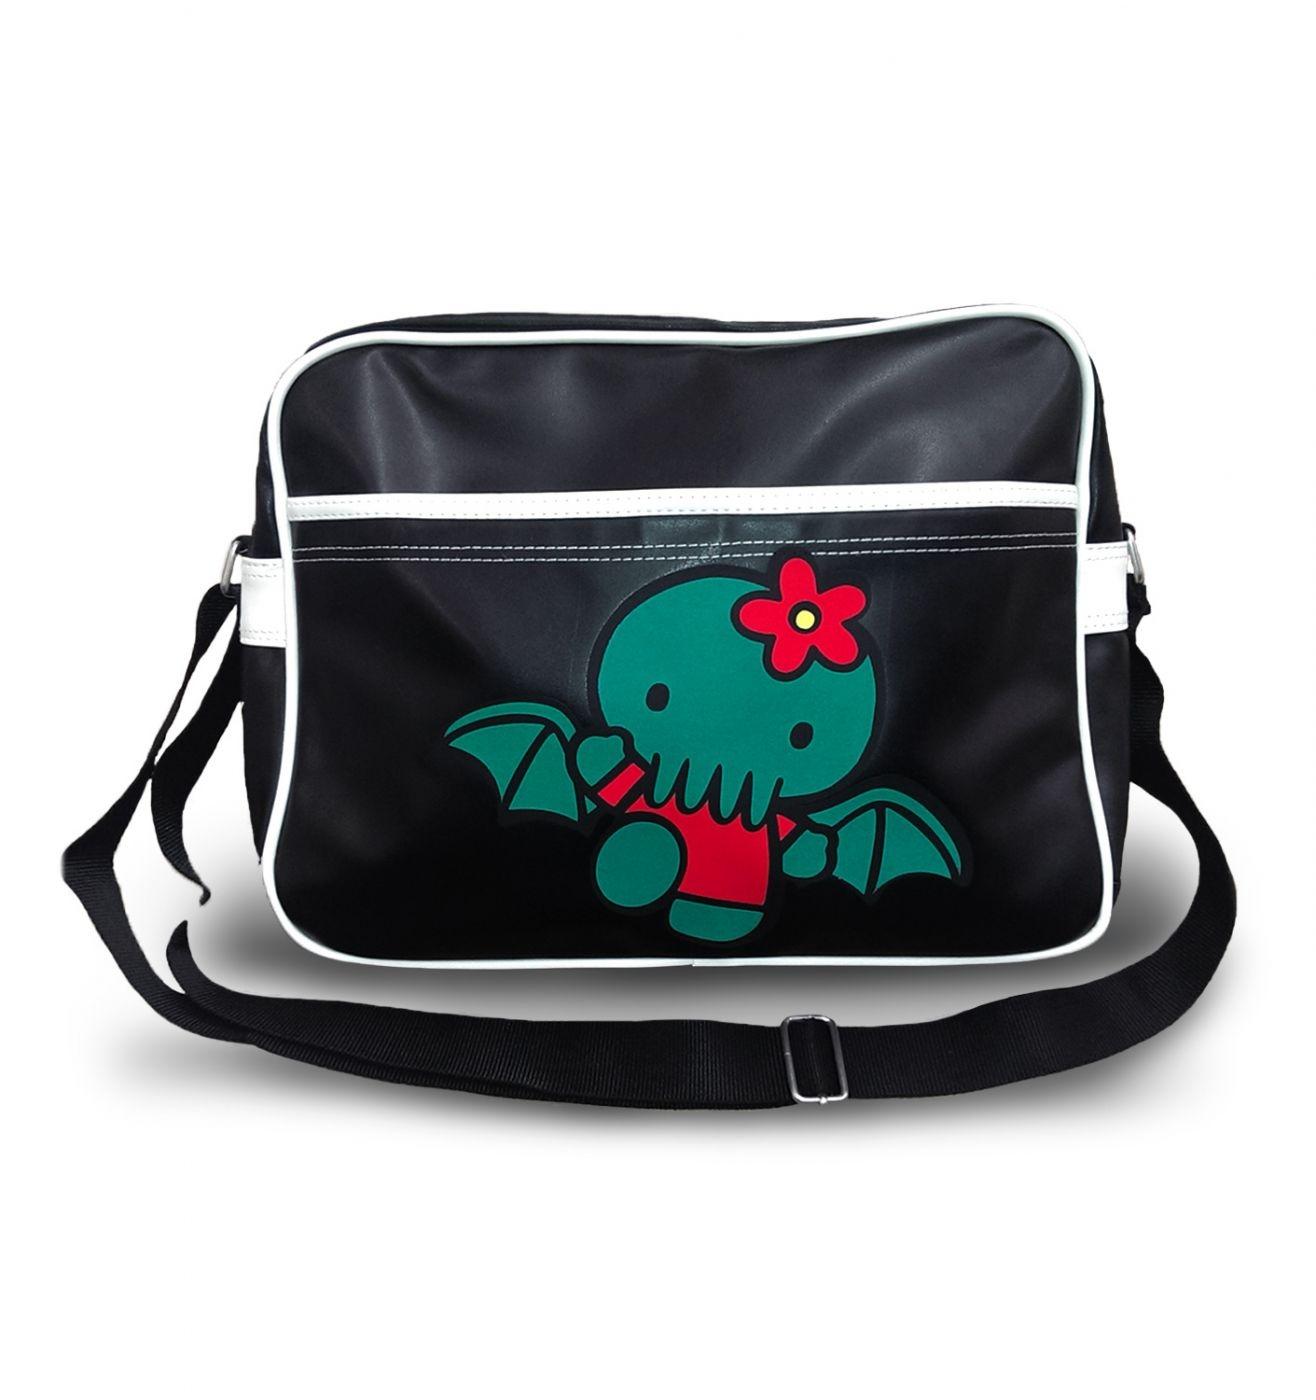 Hello Cthulhu airline messenger bag